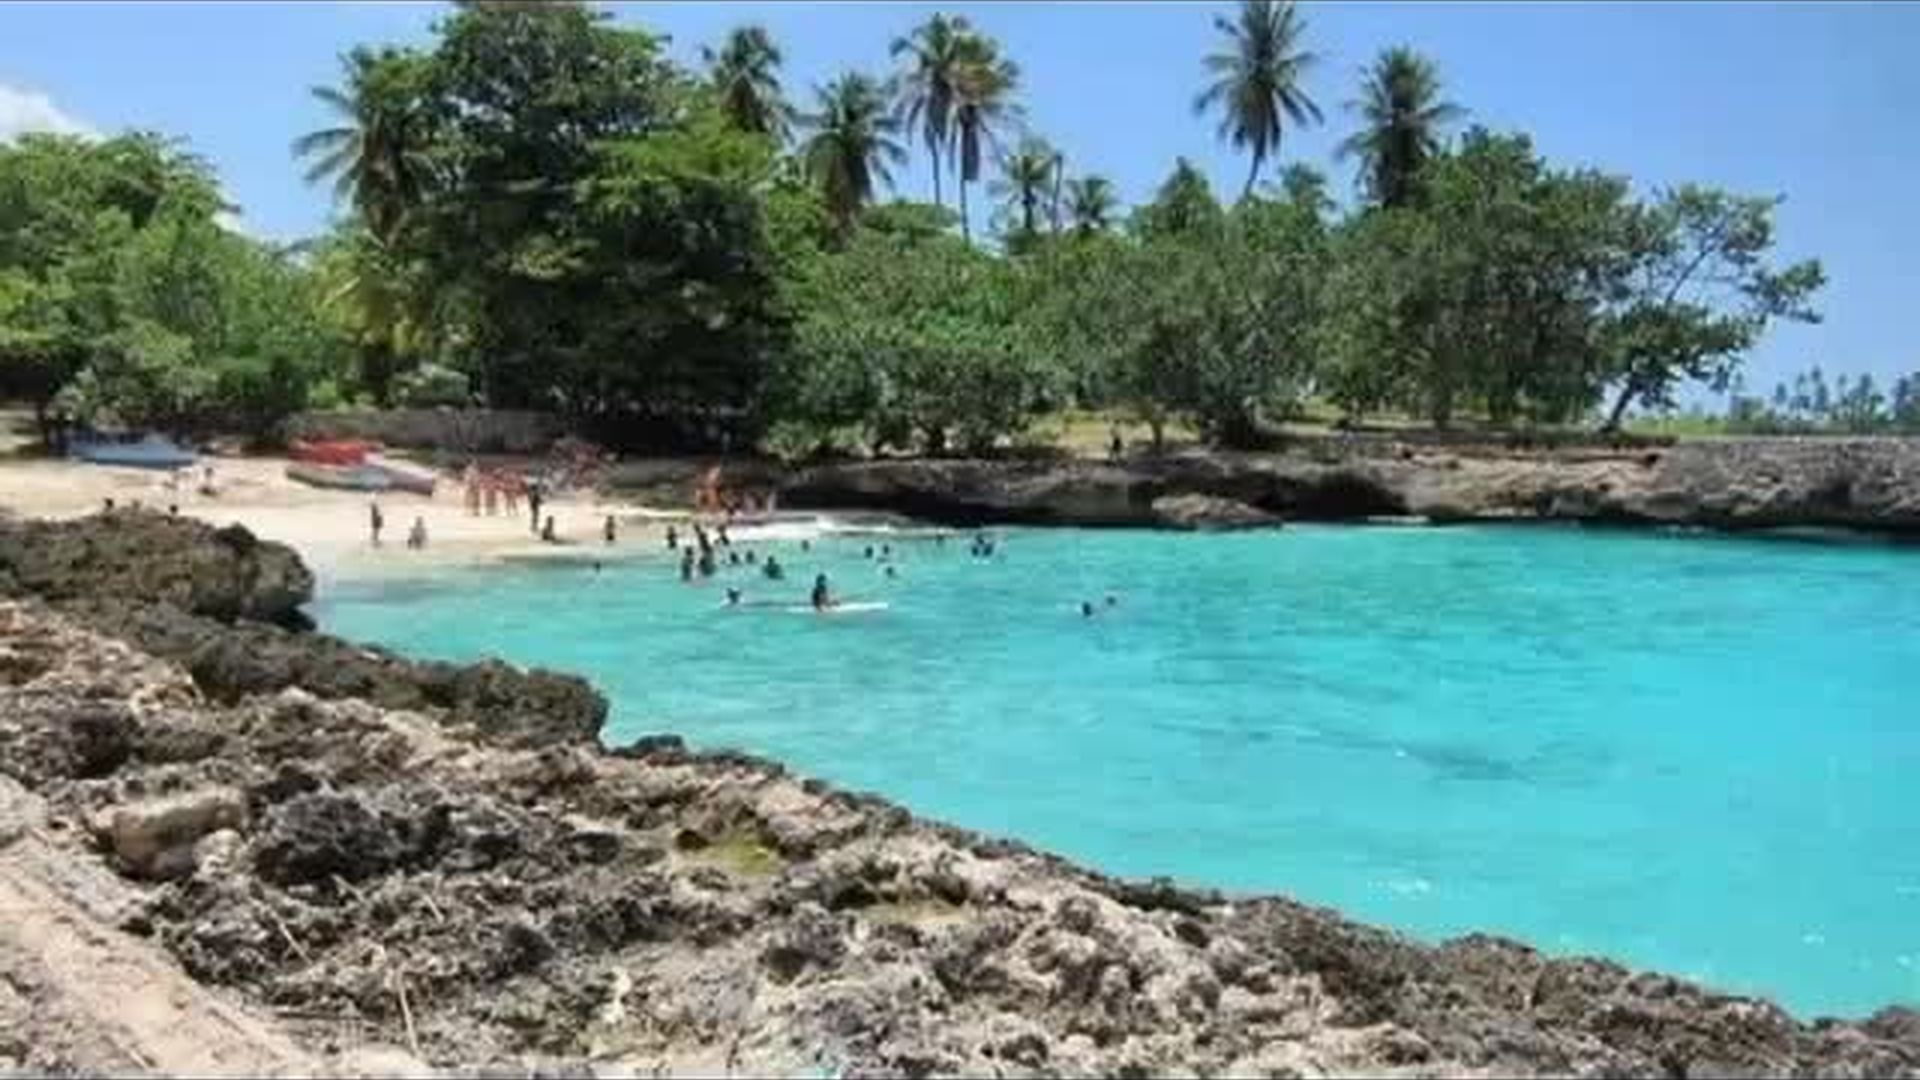 BARRIO TOURS DE BOCA CHICA DOMINICAN REPUBLIC TOUR GUIDE